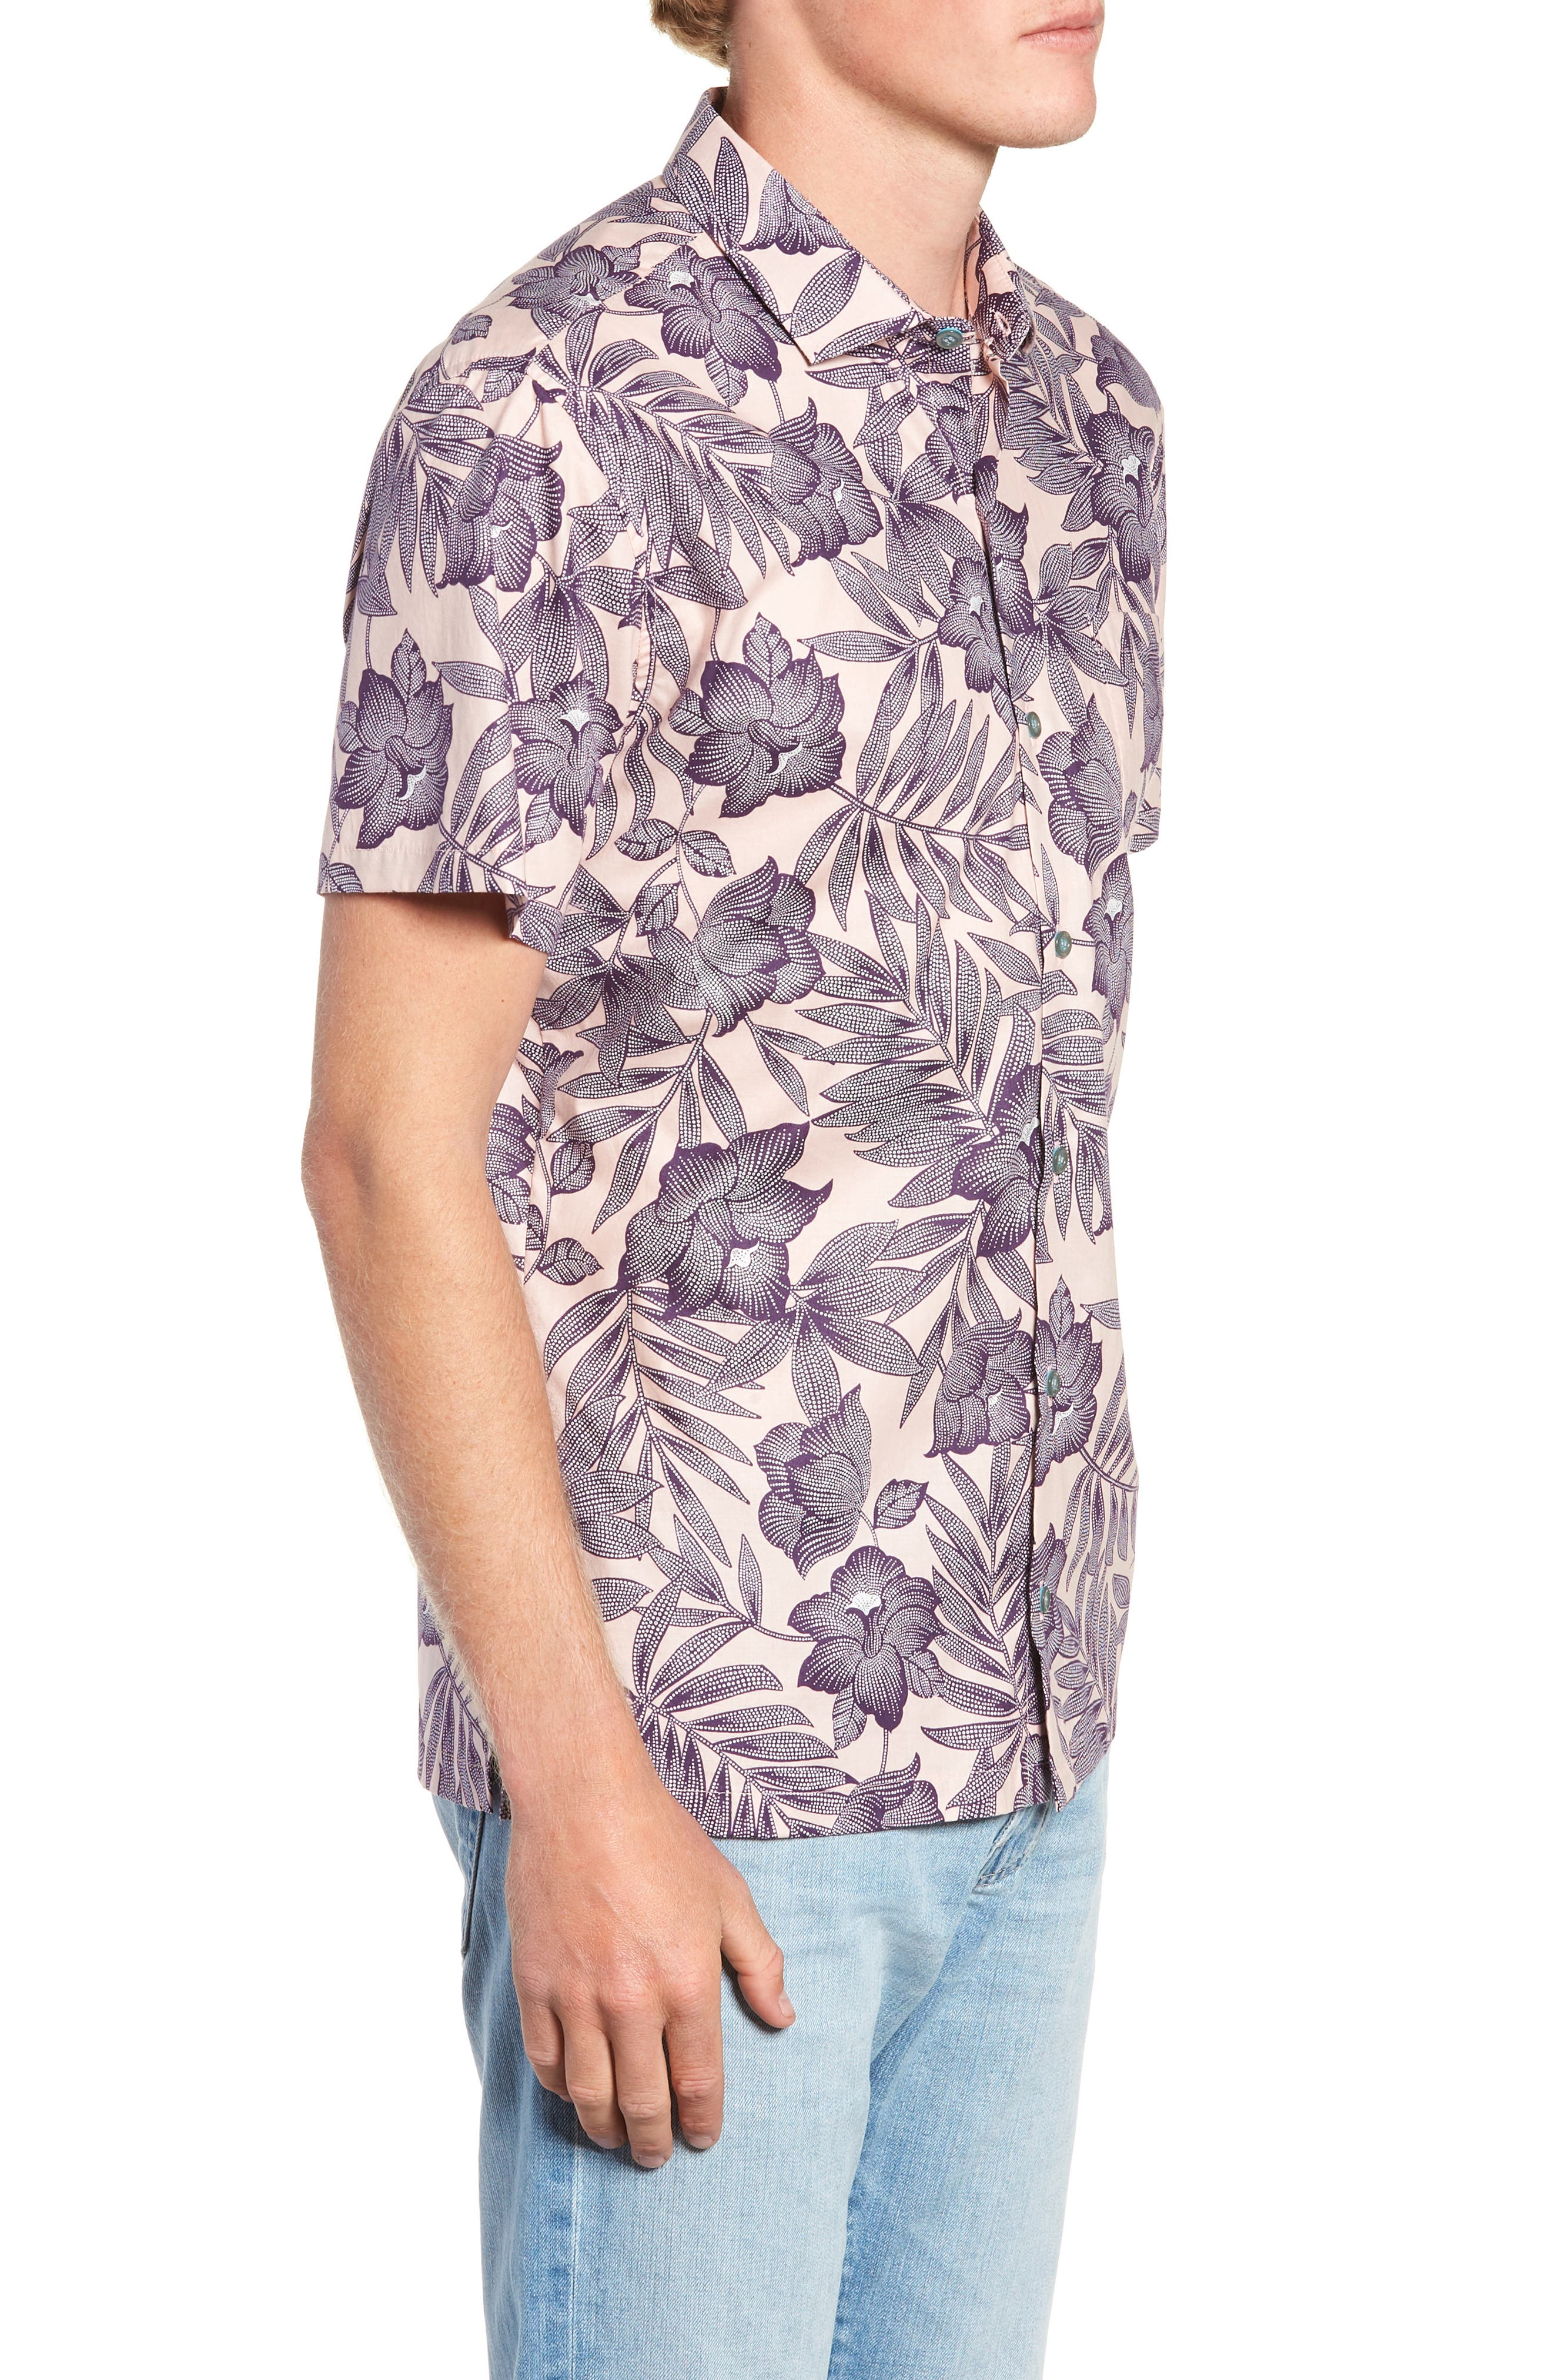 TORI RICHARD, Pollenesia Regular Fit Sport Shirt, Alternate thumbnail 4, color, PINK